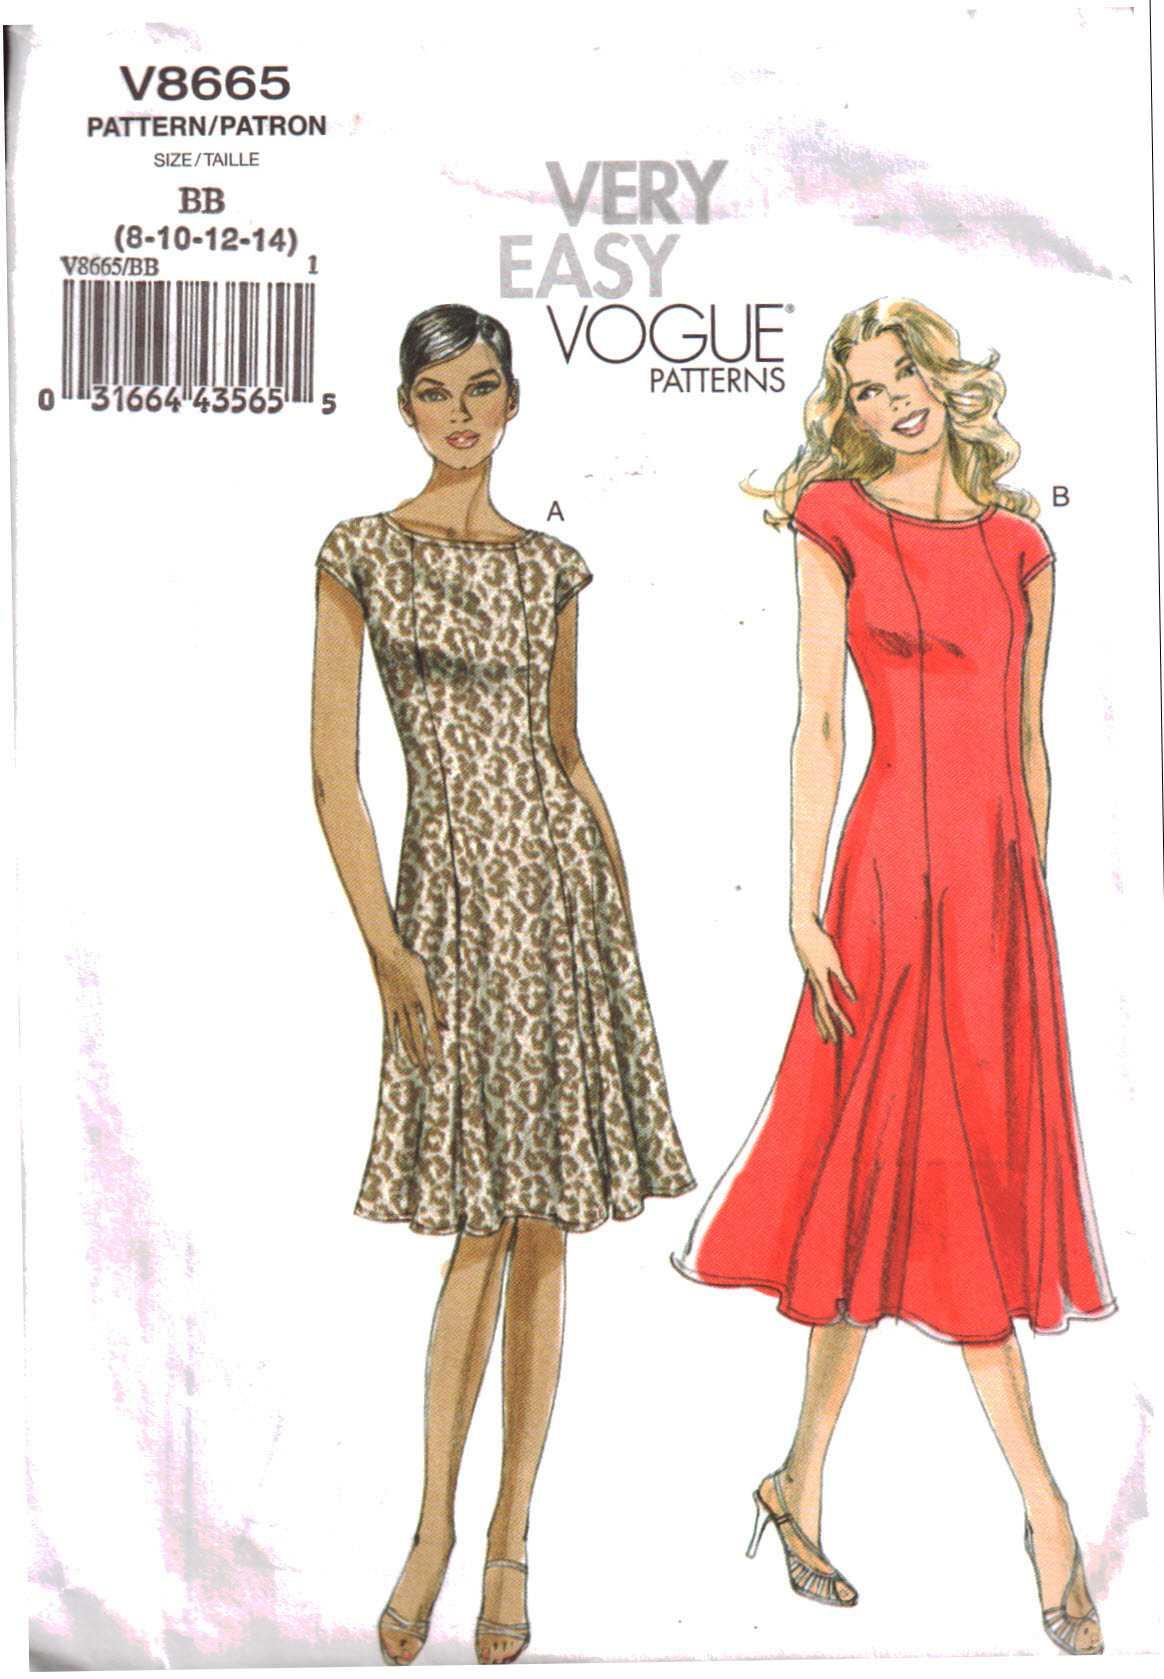 ab334f2b7 Vogue V8665 Misses'/Misses' Petite Dress Size: BB 8-10-12-14 Used Sewing  Pattern